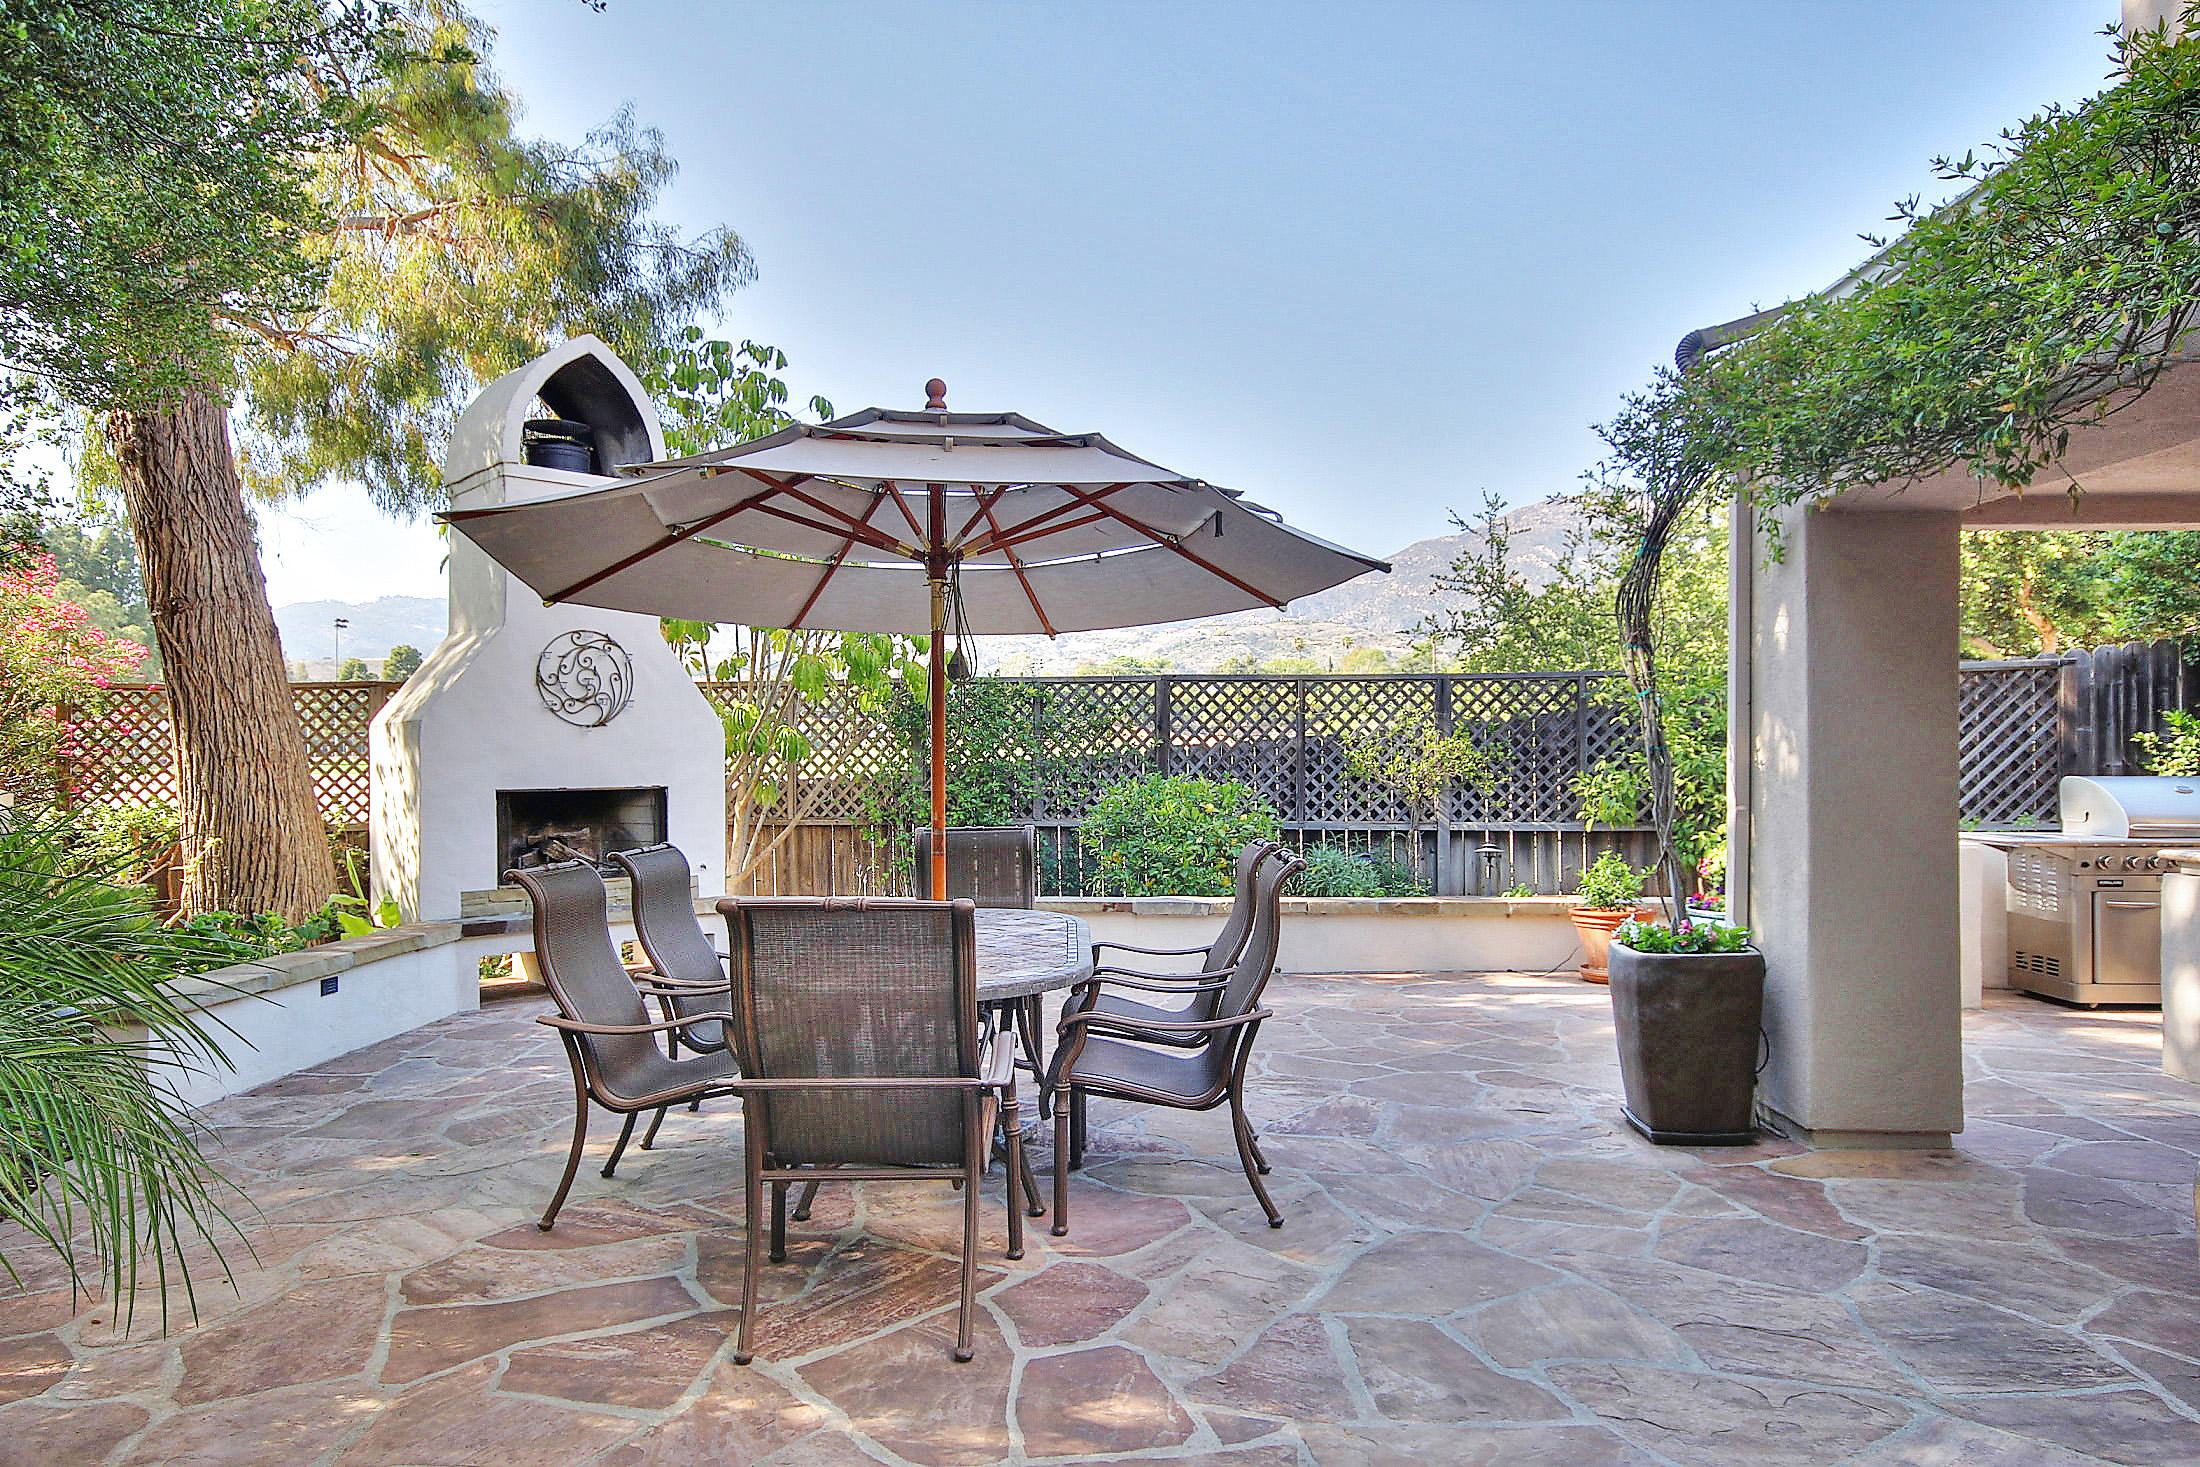 Property photo for 3990 Primavera Rd Santa Barbara, California 93110 - 14-1860